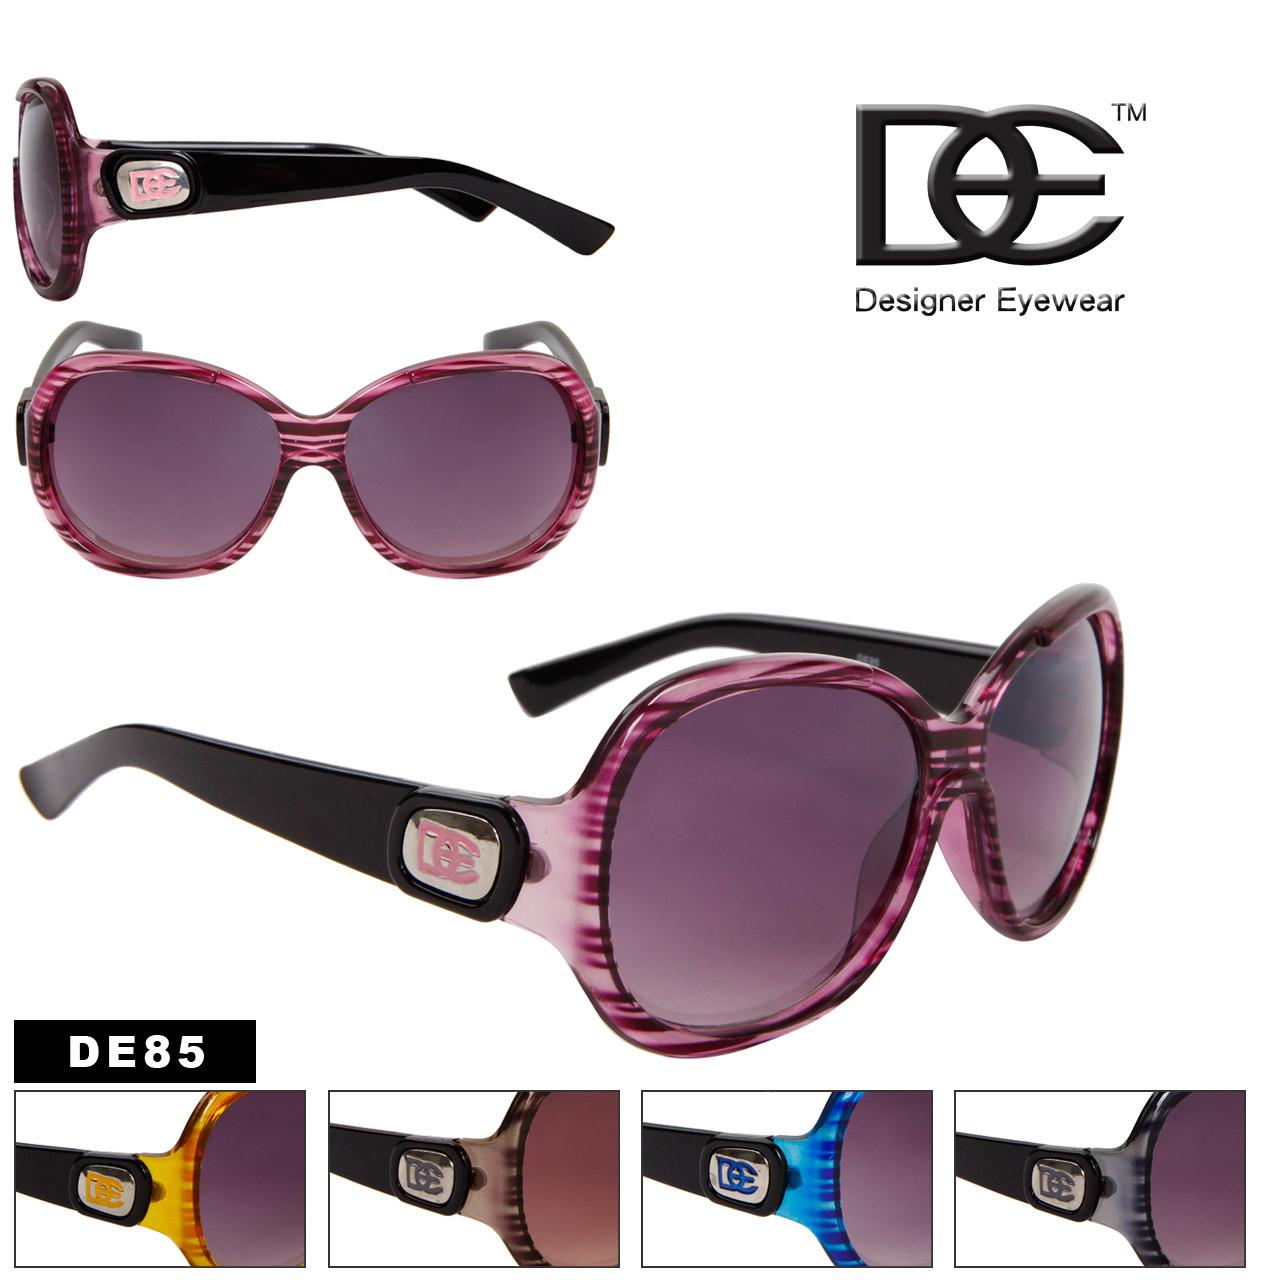 Stylish Fashion Sunglasses Wholesale DE85